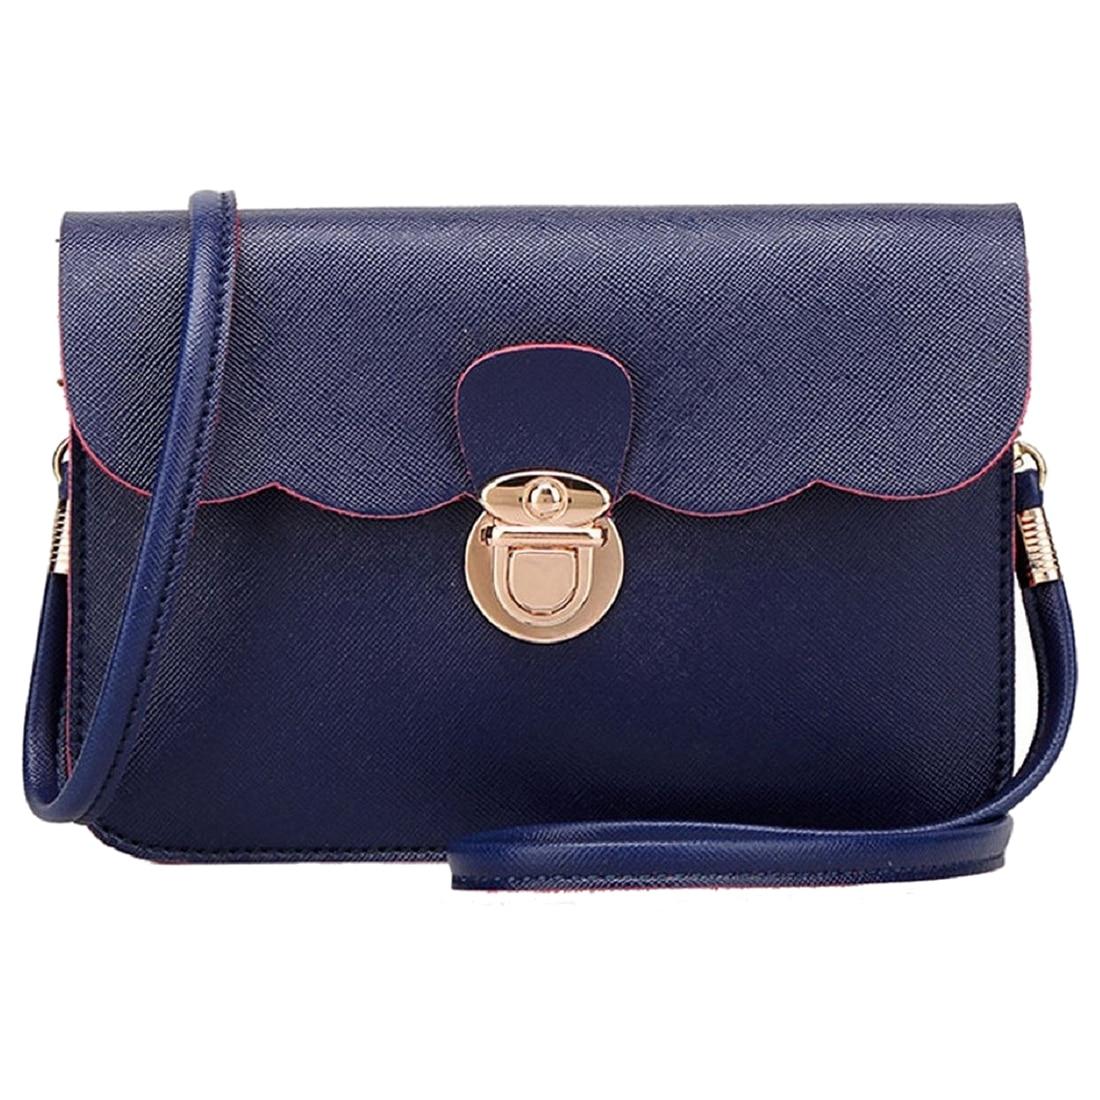 SCYL Fashion Women's PU Leather Shoulder Bag Clutch Handbag Tote Purse Hobo Messenger (Deep Blue) women s fashion pu leather messenger hobo handbag purse shoulder bag purse lady tote black